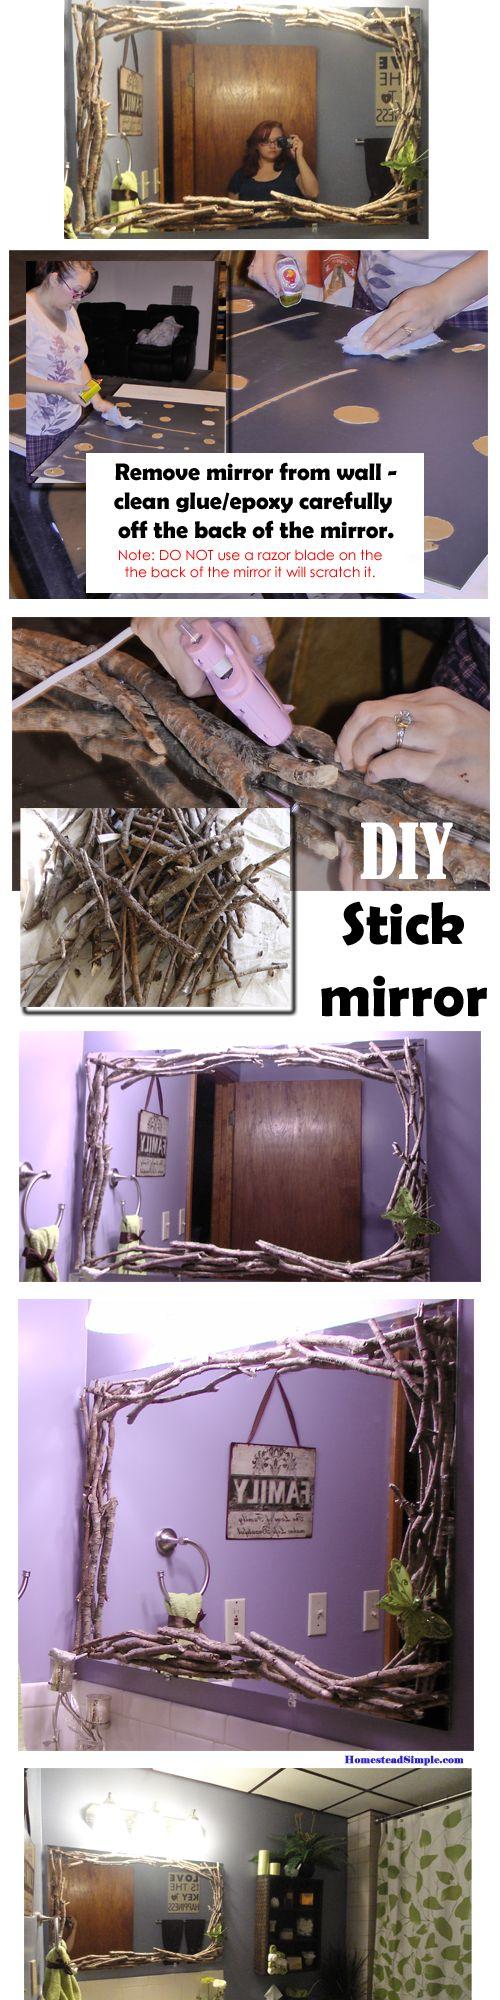 best 25 camo bathroom ideas on pinterest camo home decor diy diy stick twig mirror frame bathroom home decor